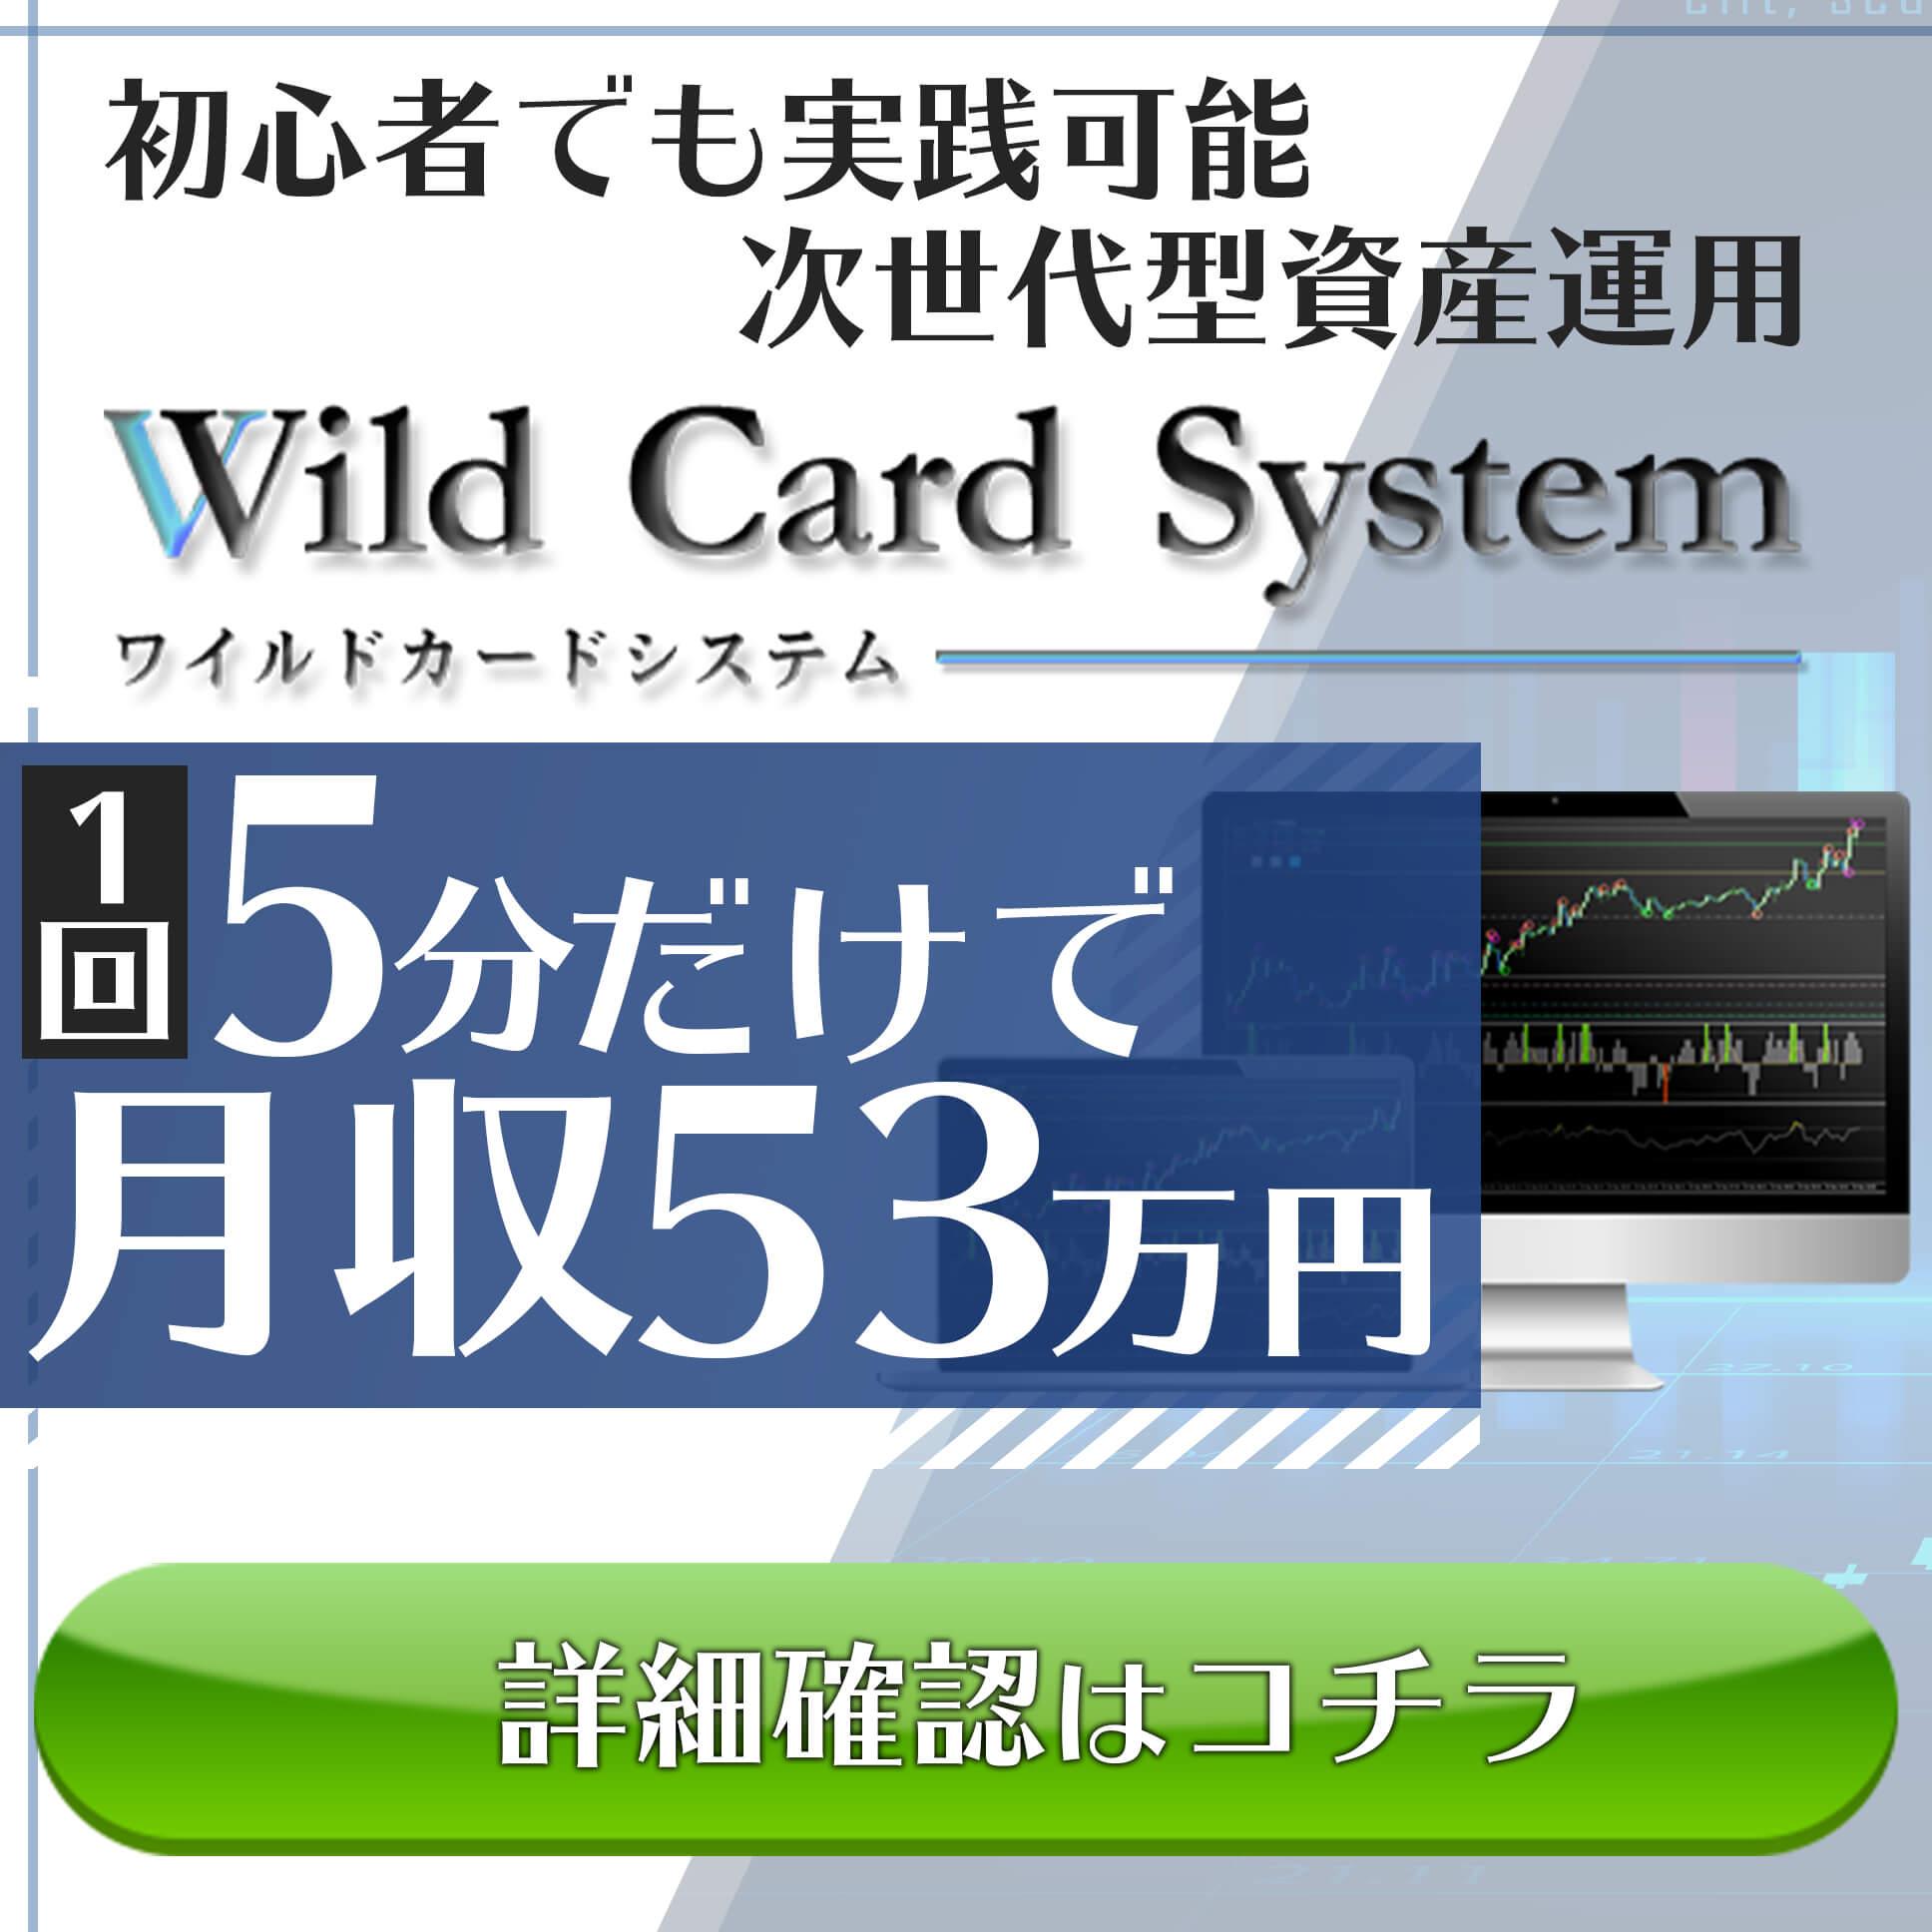 WildCardSystem(ワイルドカードシステム)のレビュー